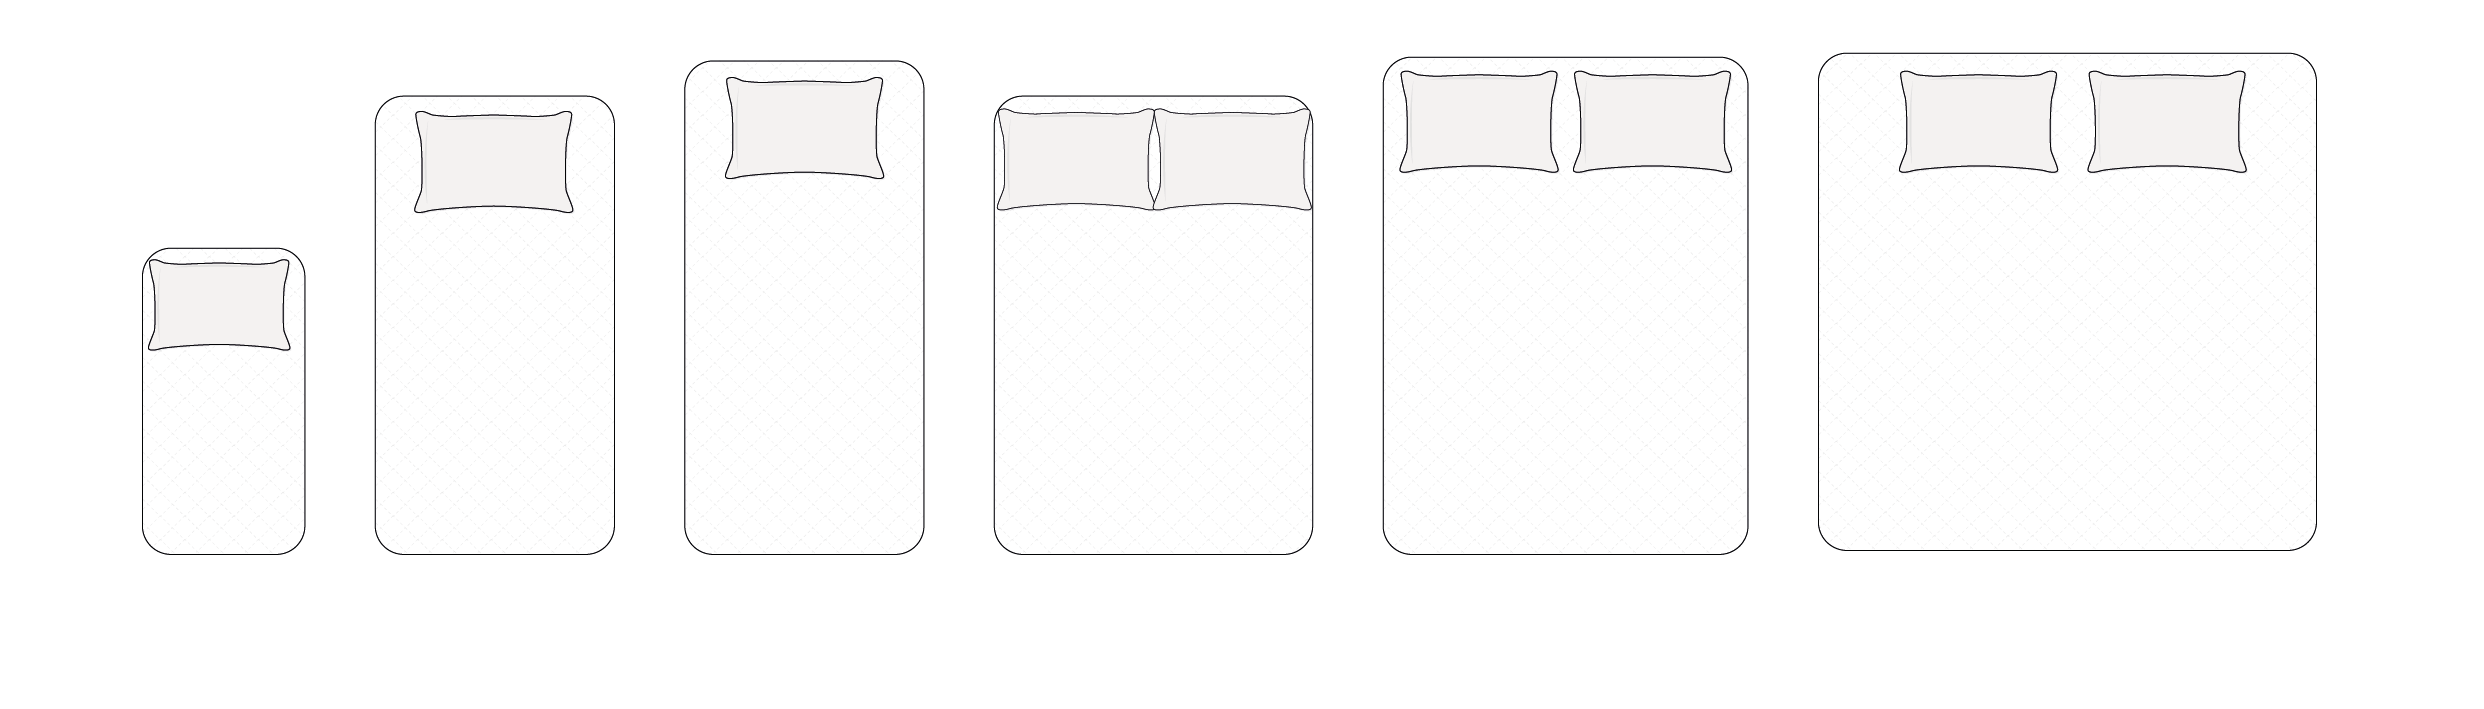 Mattres Debugger sizes